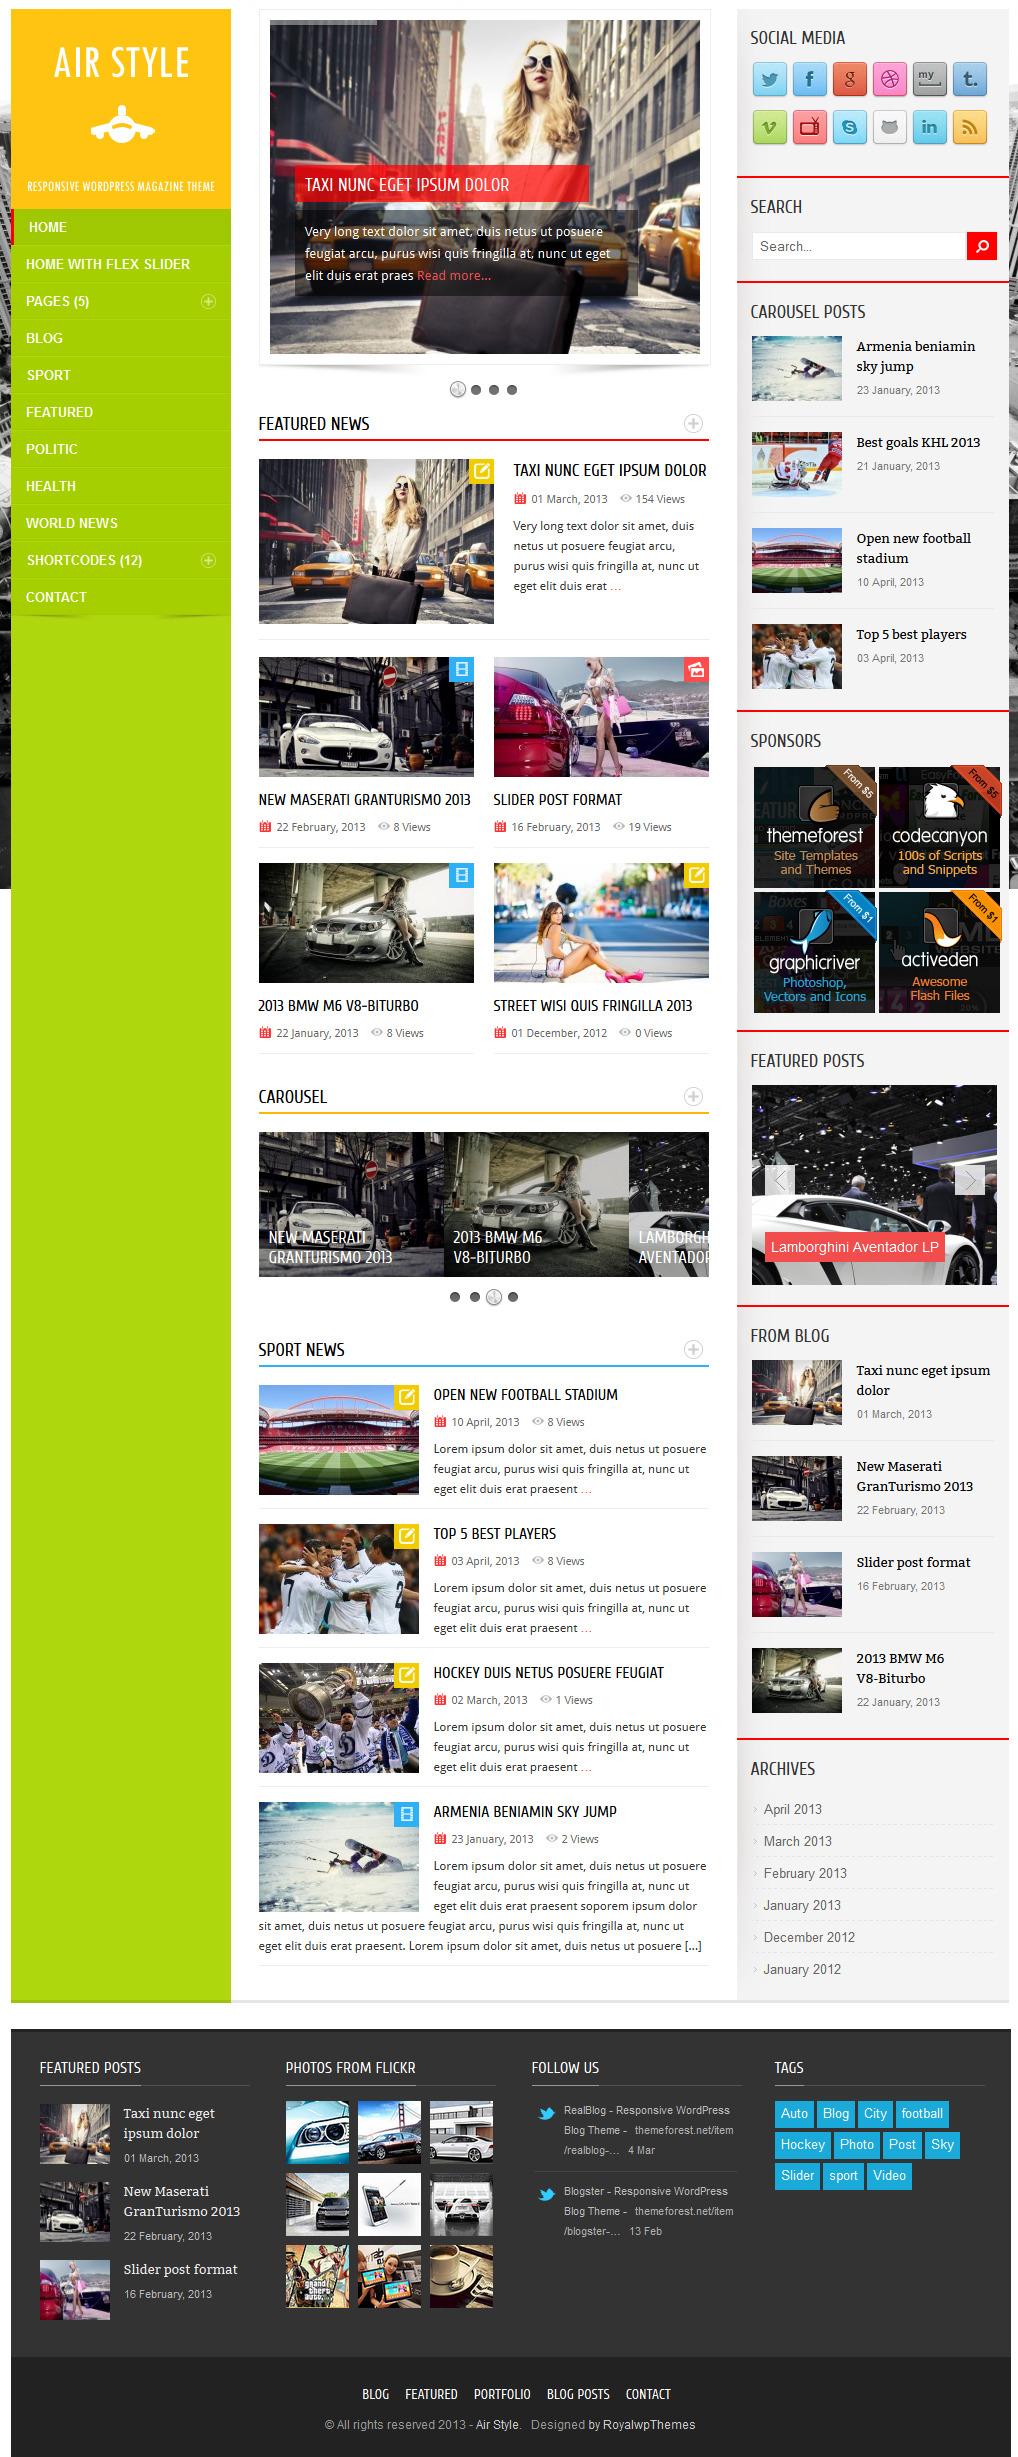 Air Style - Responsive WordPress Magazine Theme